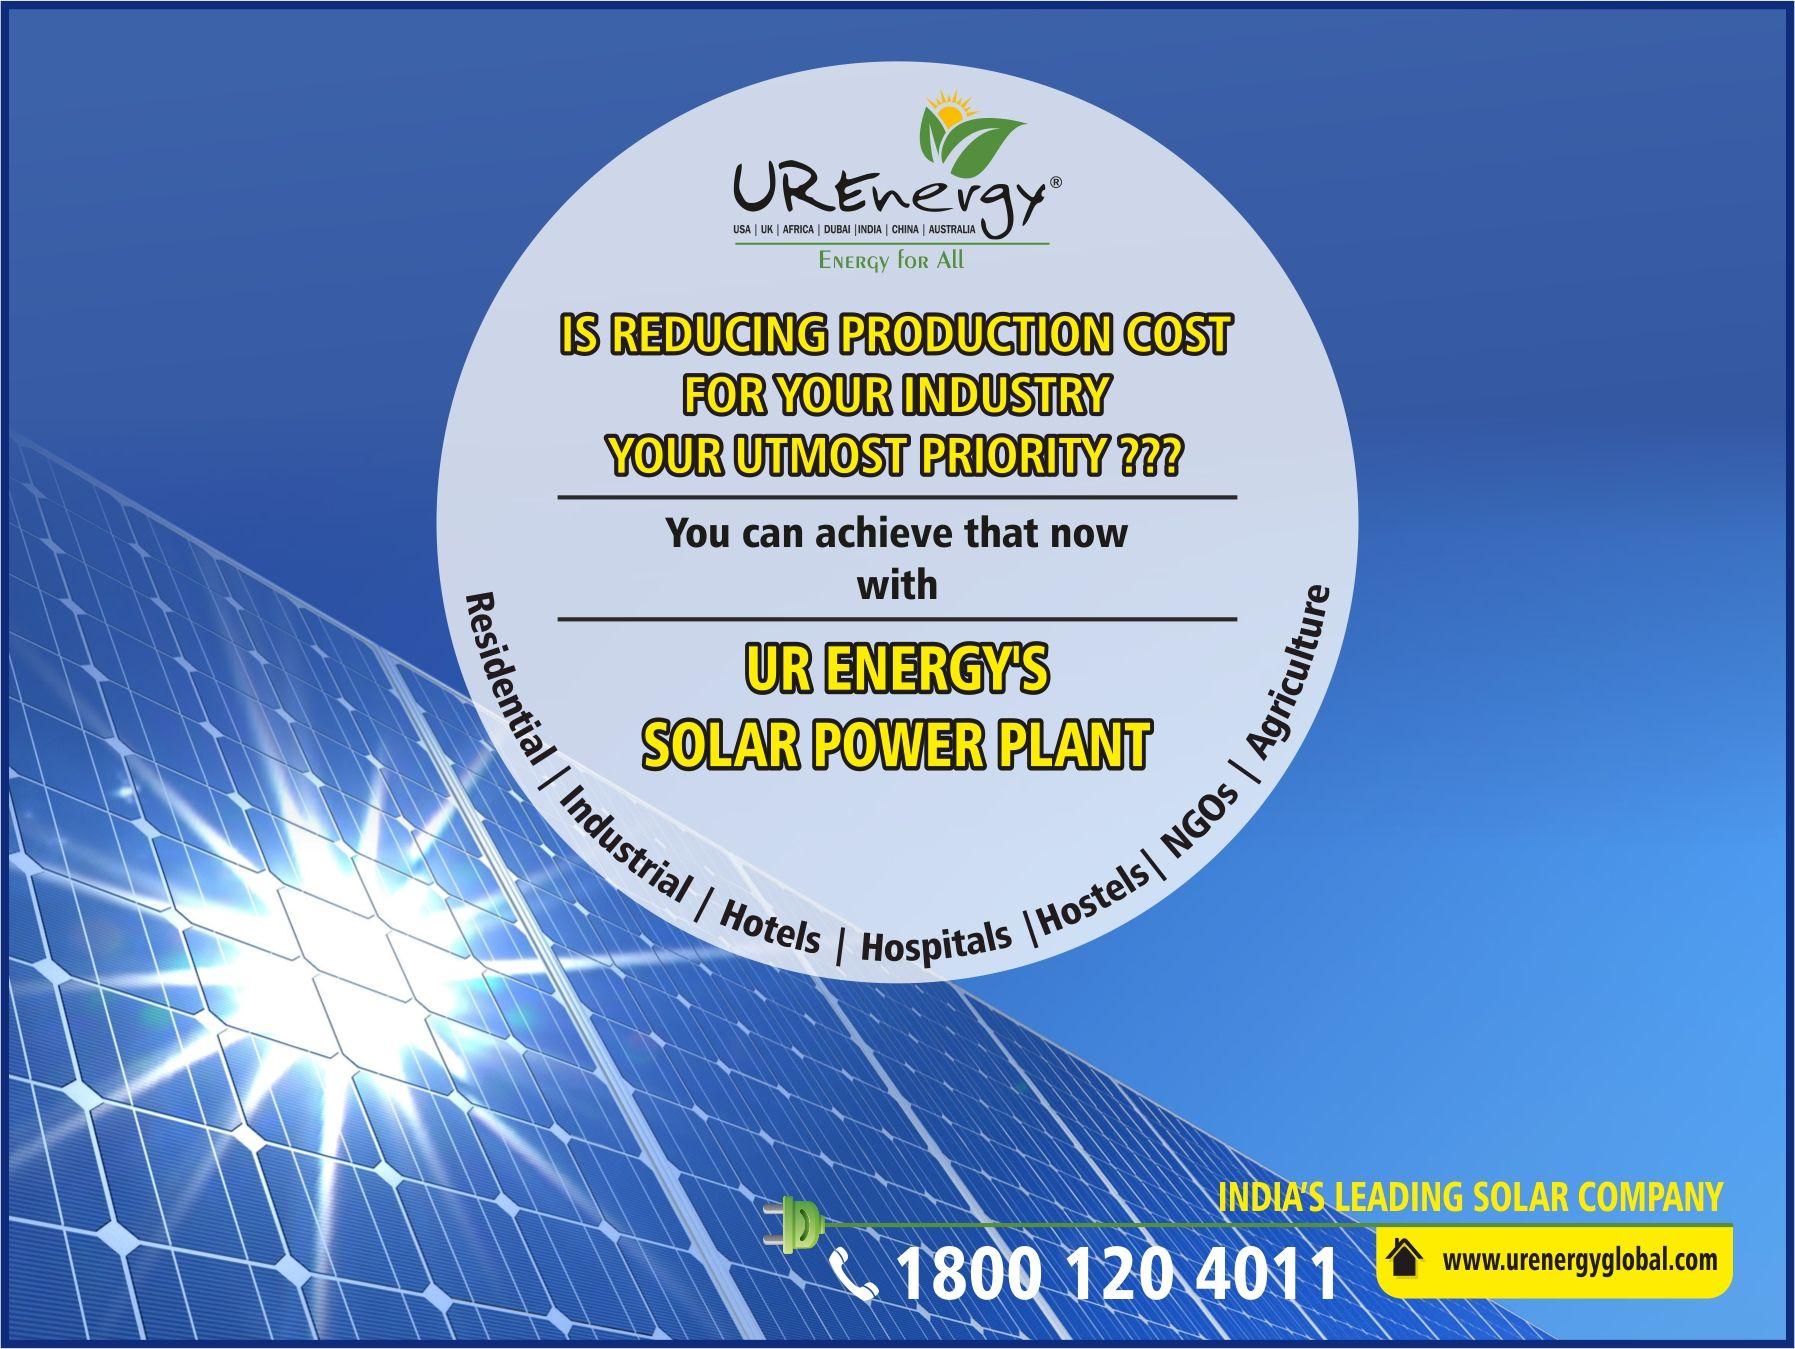 Rooftop Solar Panel Inverters Water Pump Solar Epc Gujarat India U R Energy Solar Solar Water Pump Solar Companies